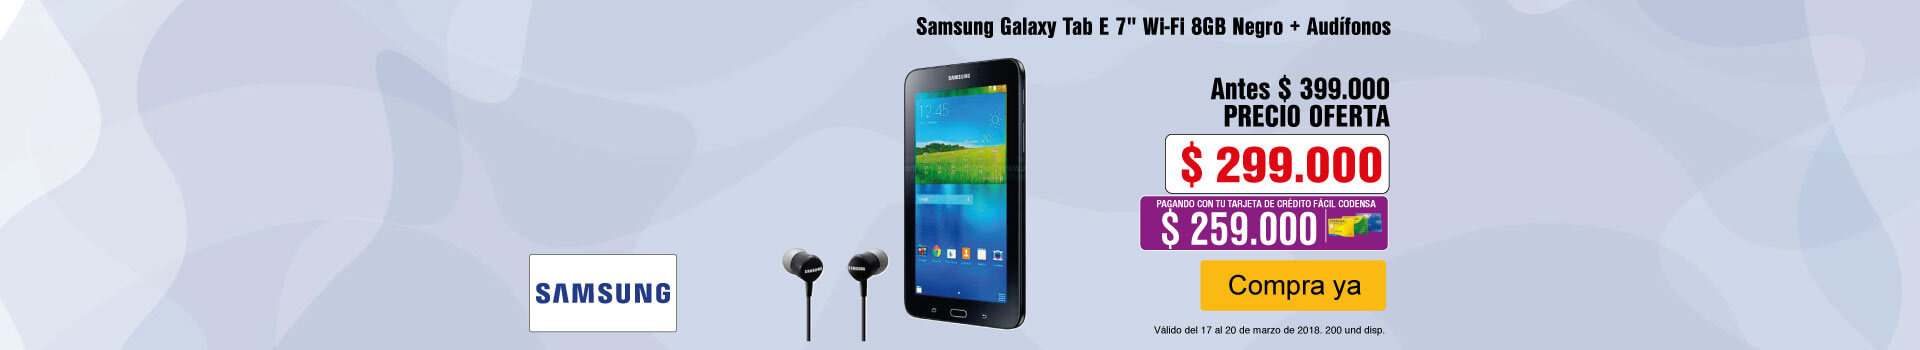 CAT AK-KT-4-computadores-Samsung Galaxy Tab E 7